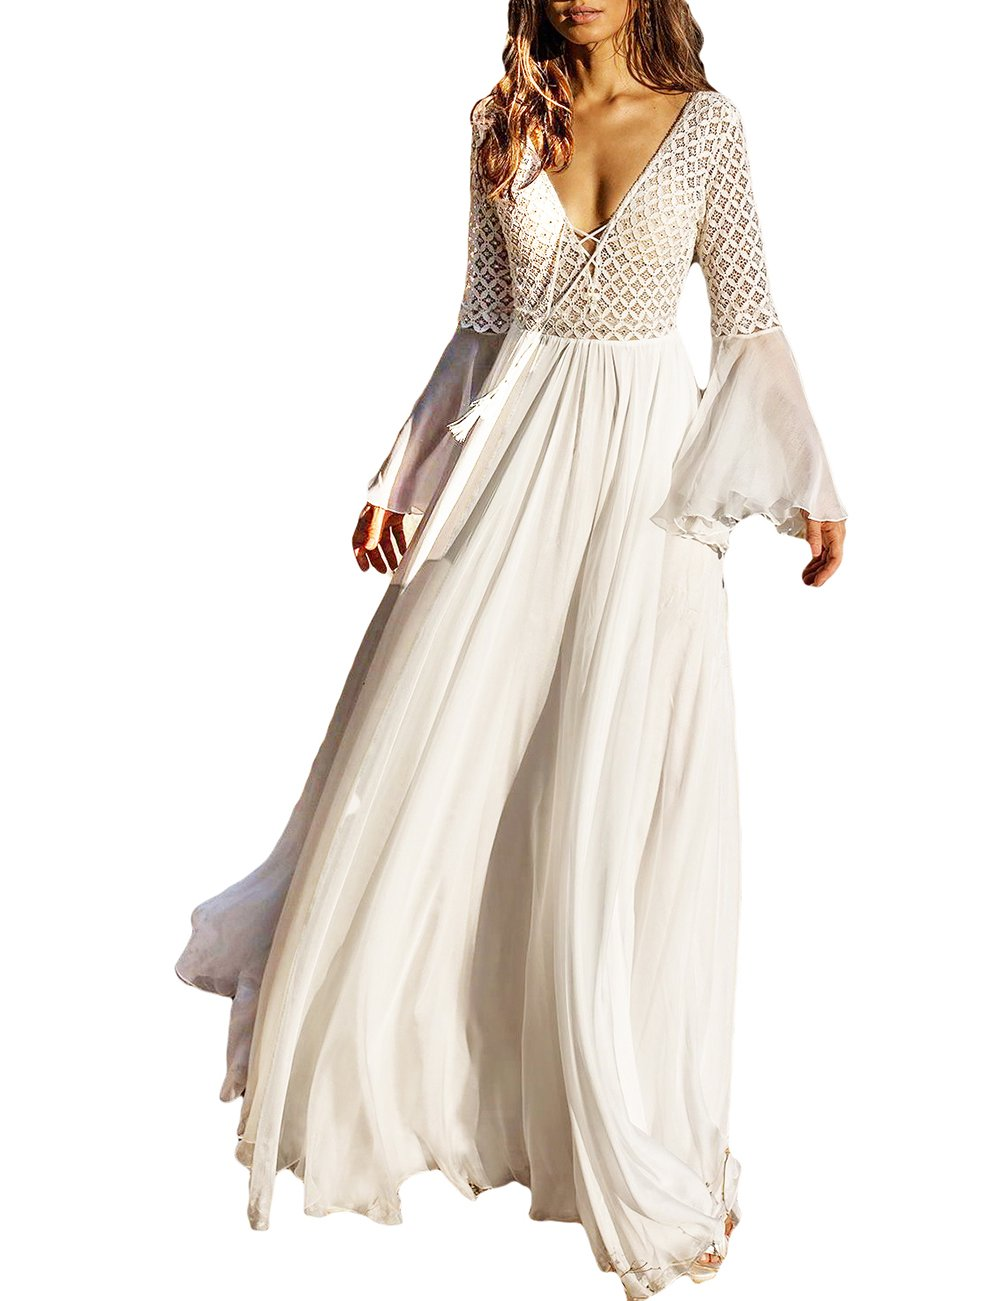 Bsubseach White Chiffon Bell Sleeve Beach Long Dresses for Women Sexy Deep V Neck Hollow Out Beachwear Swimwear Cover Up Dress